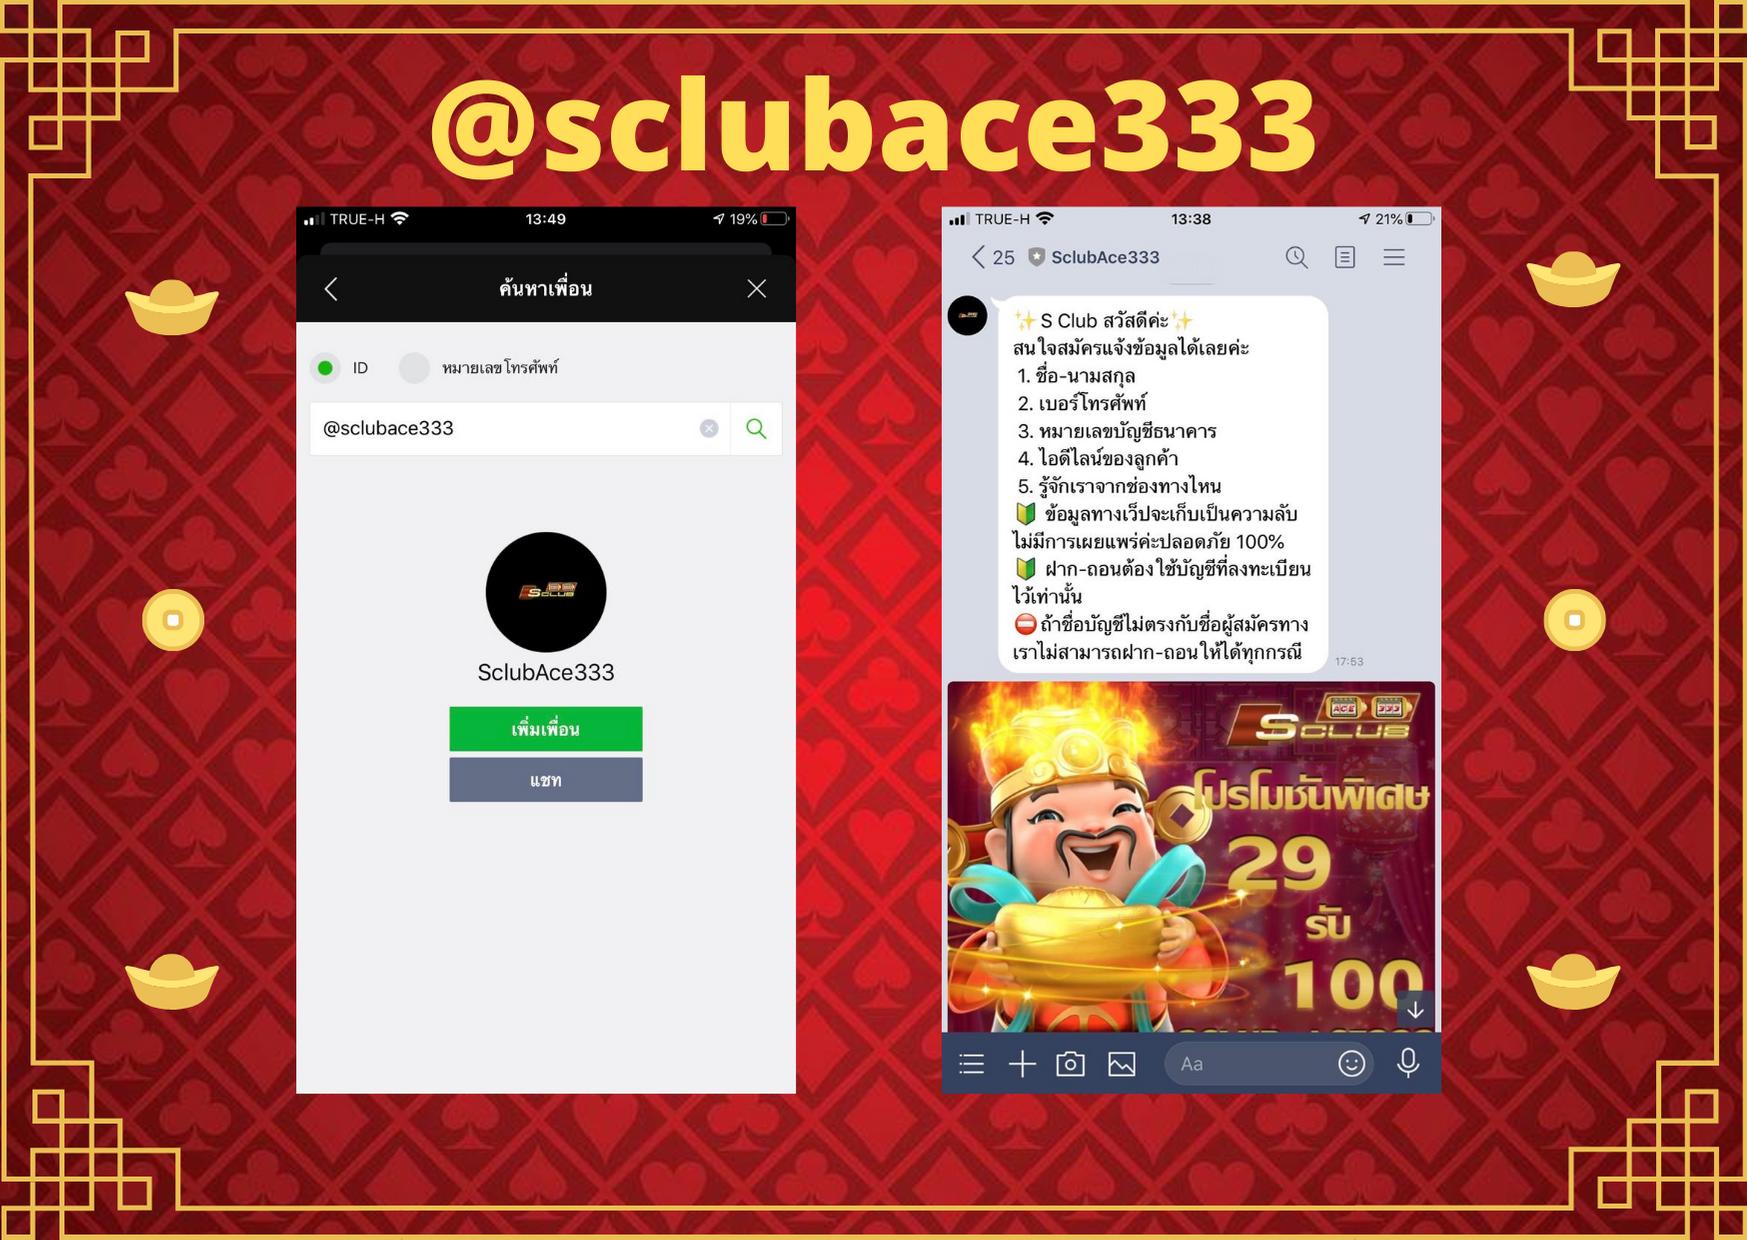 Sclub_ace333_slot สล็อตออนไลน์ เครดิตฟรีมากมาย สล็อตxo